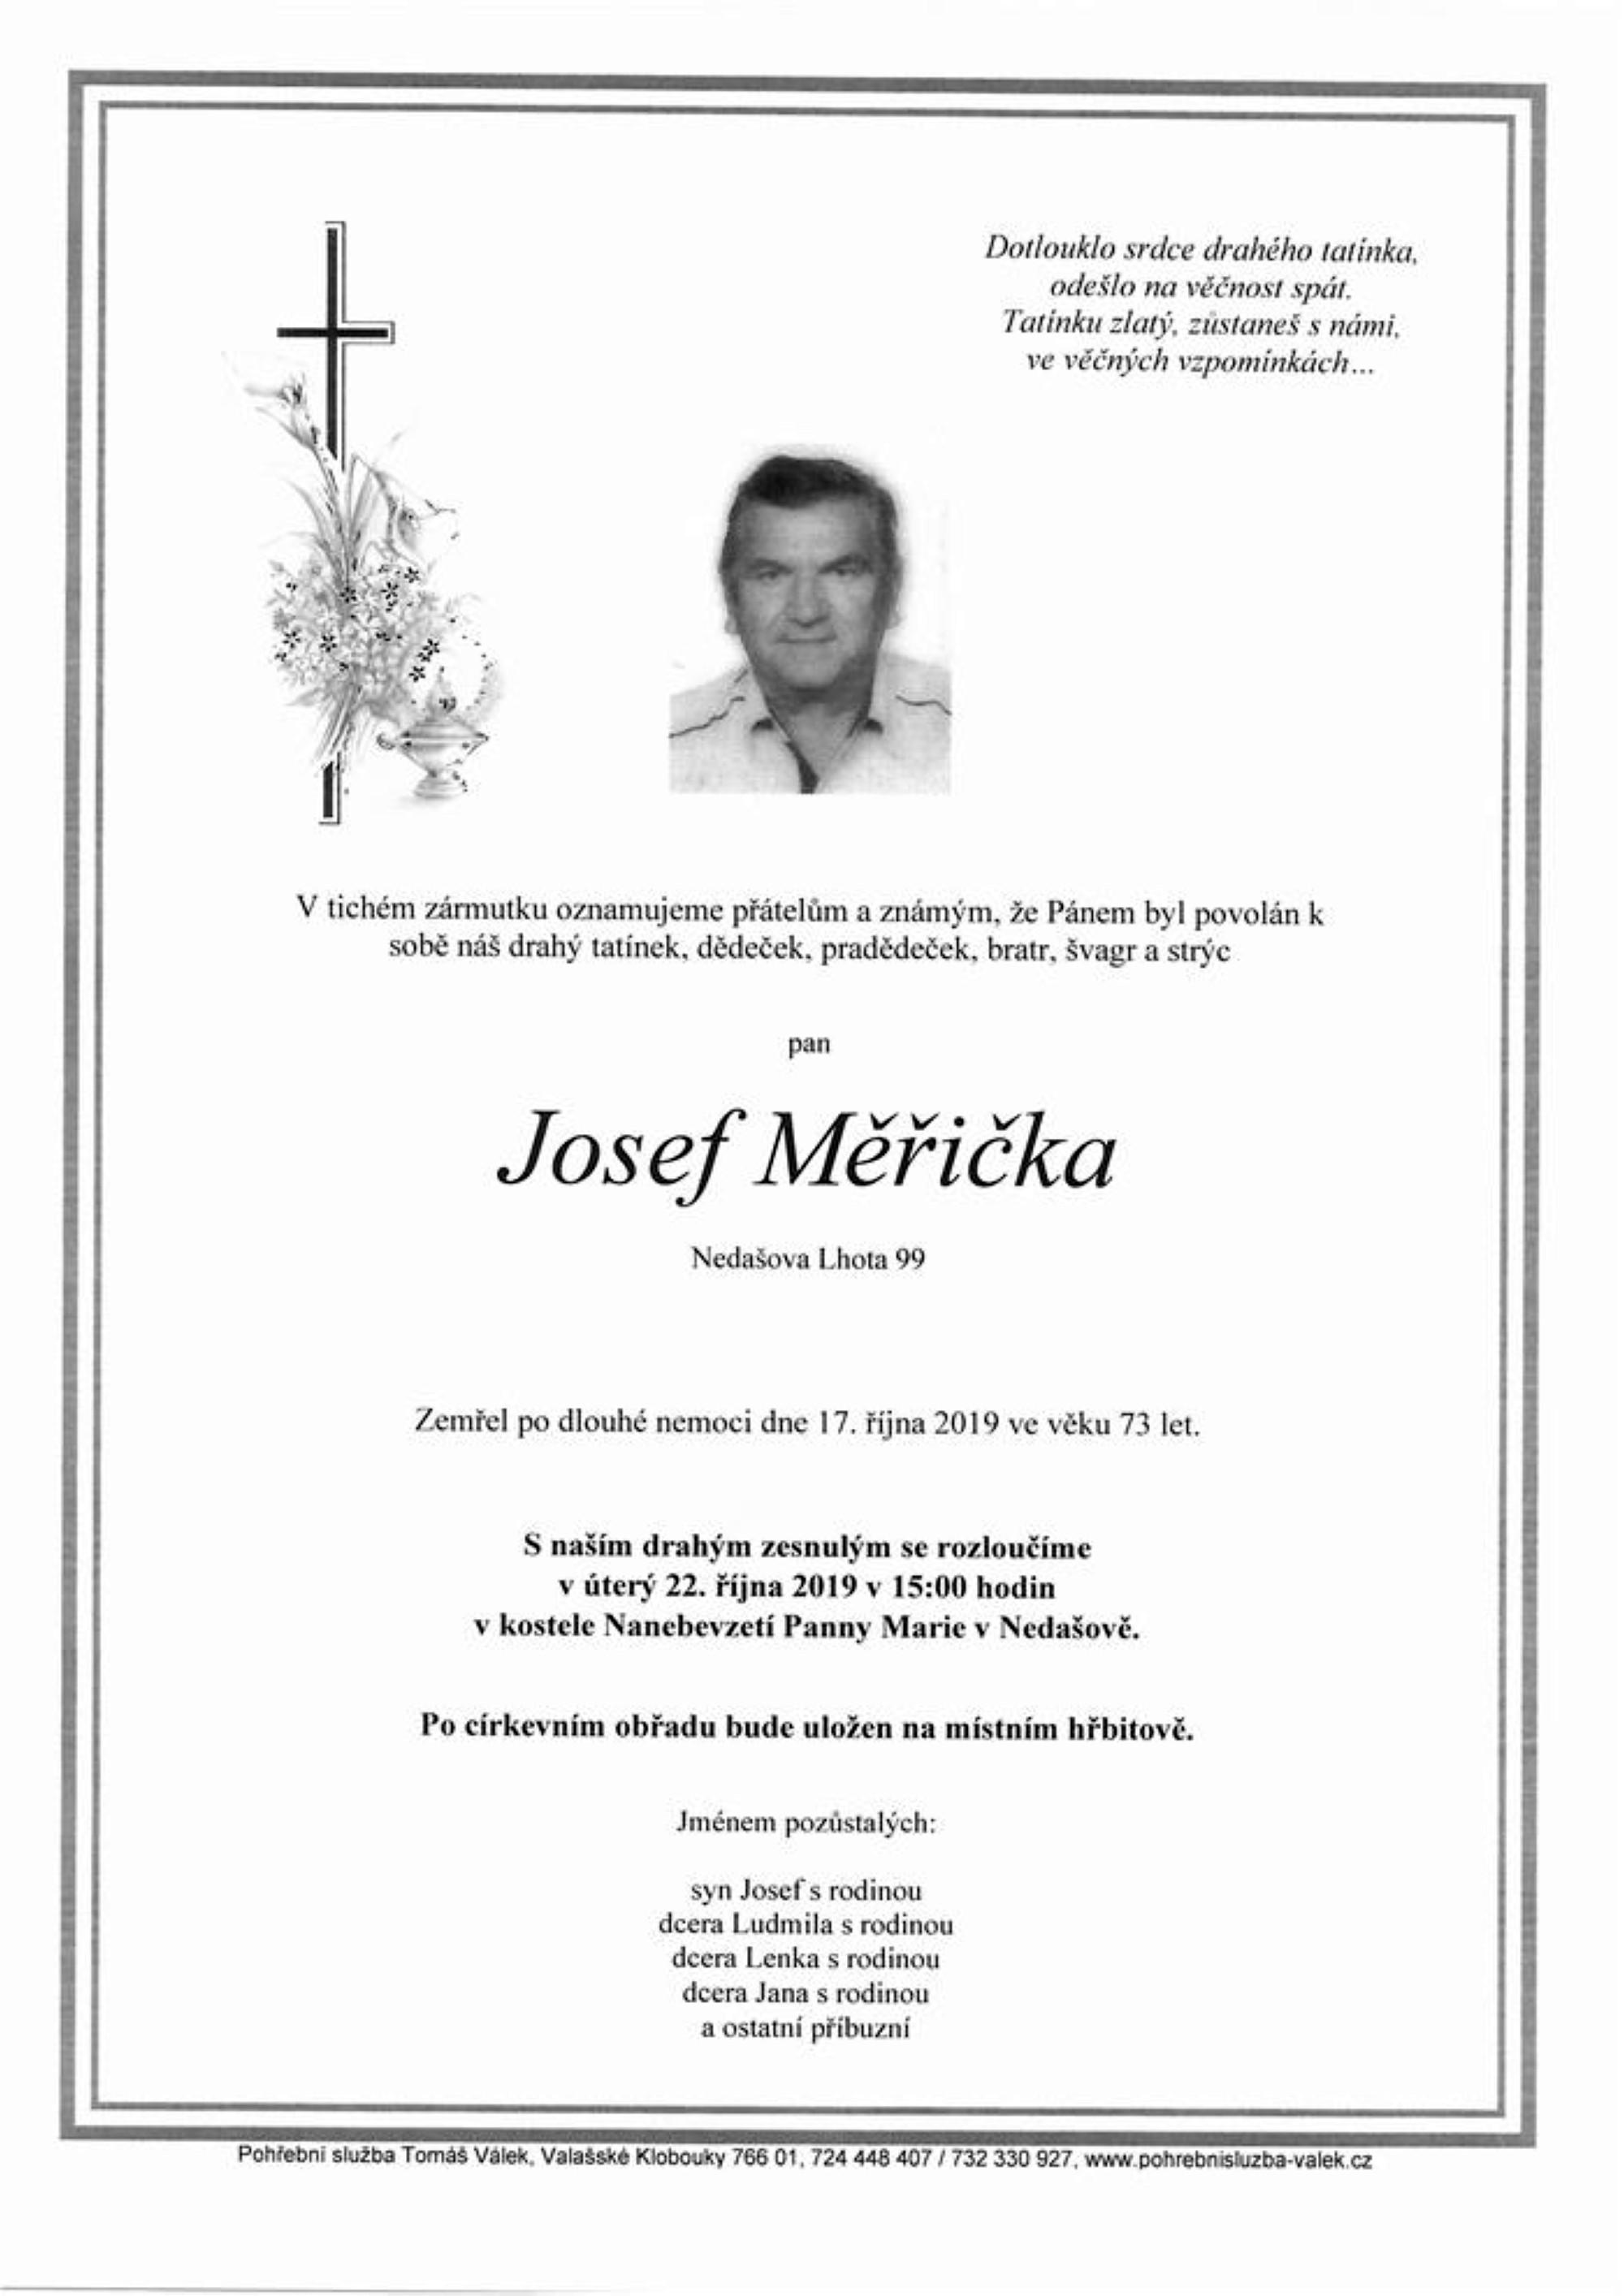 Josef Měřička